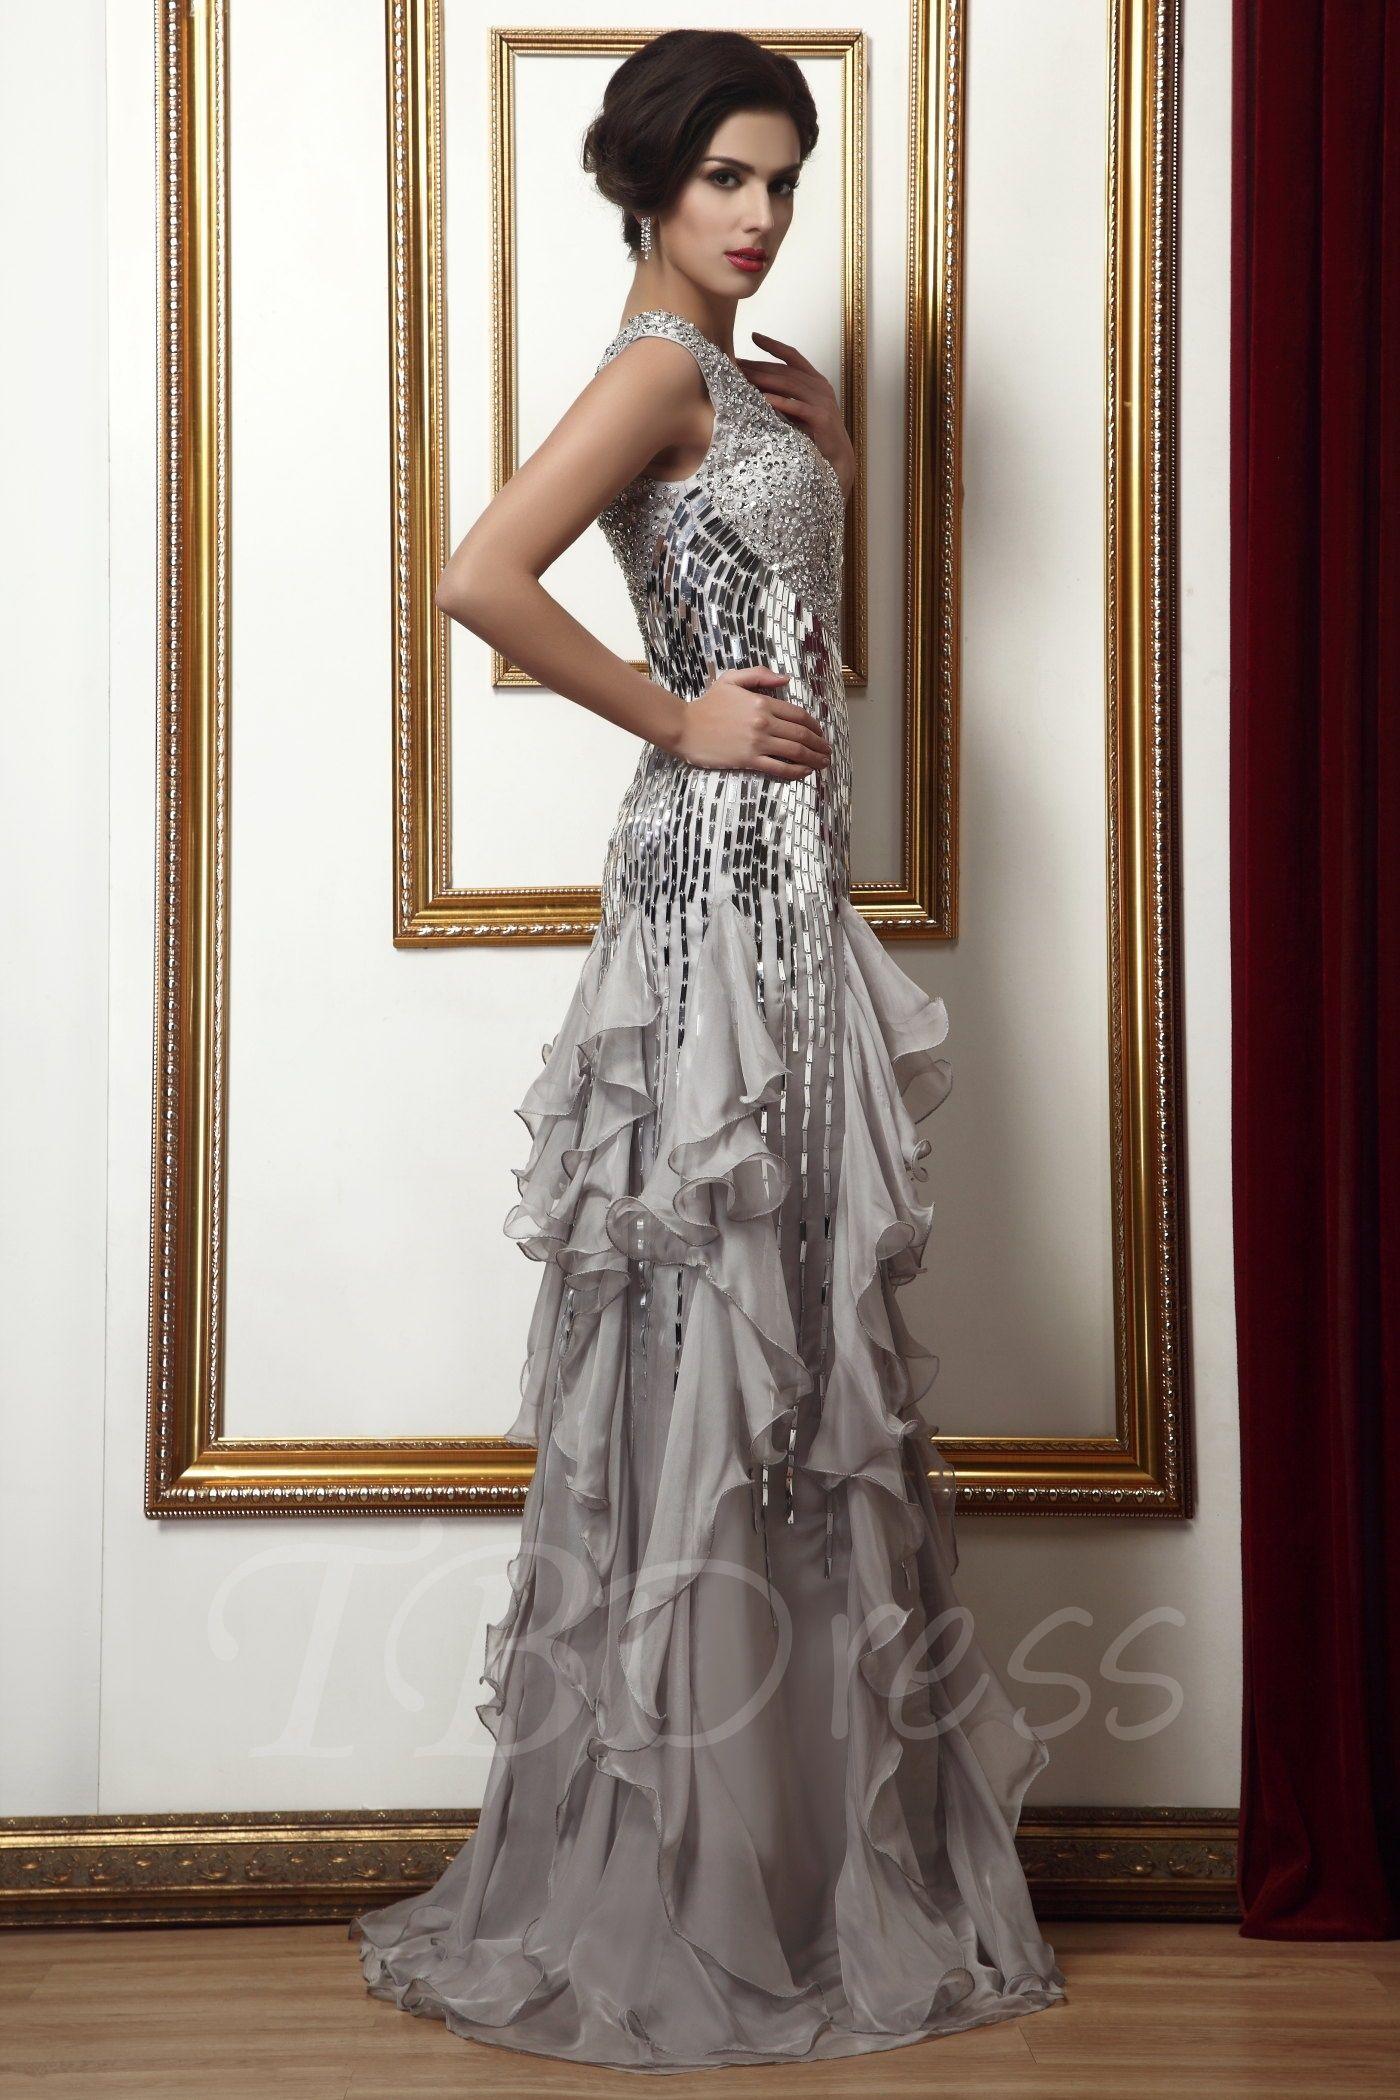 Beadingsequins ruffles sheathcolumn mother of the bride dress